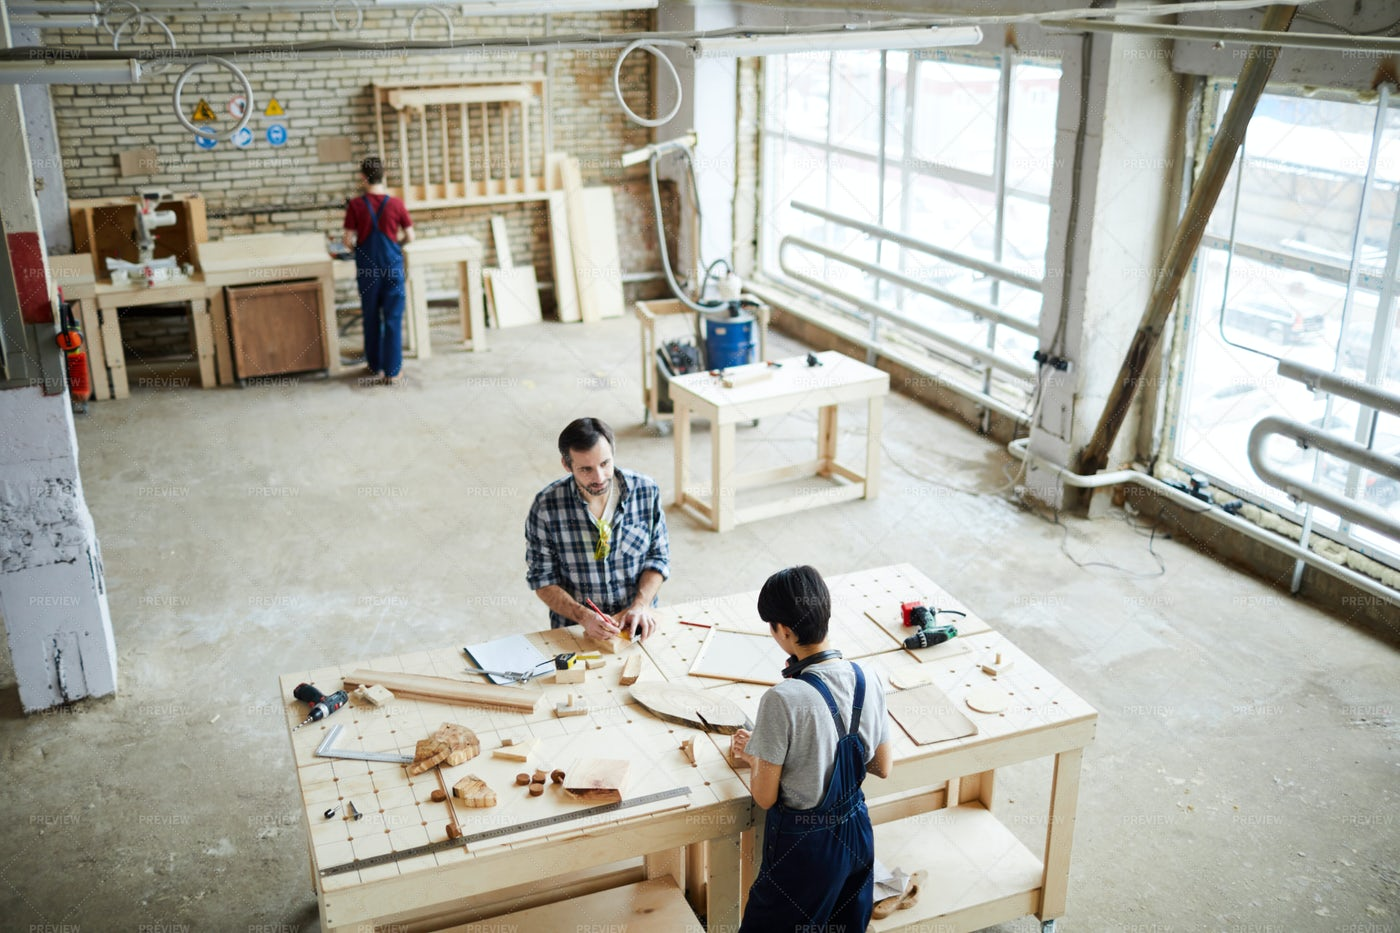 Carpenters Making Wooden Frames: Stock Photos